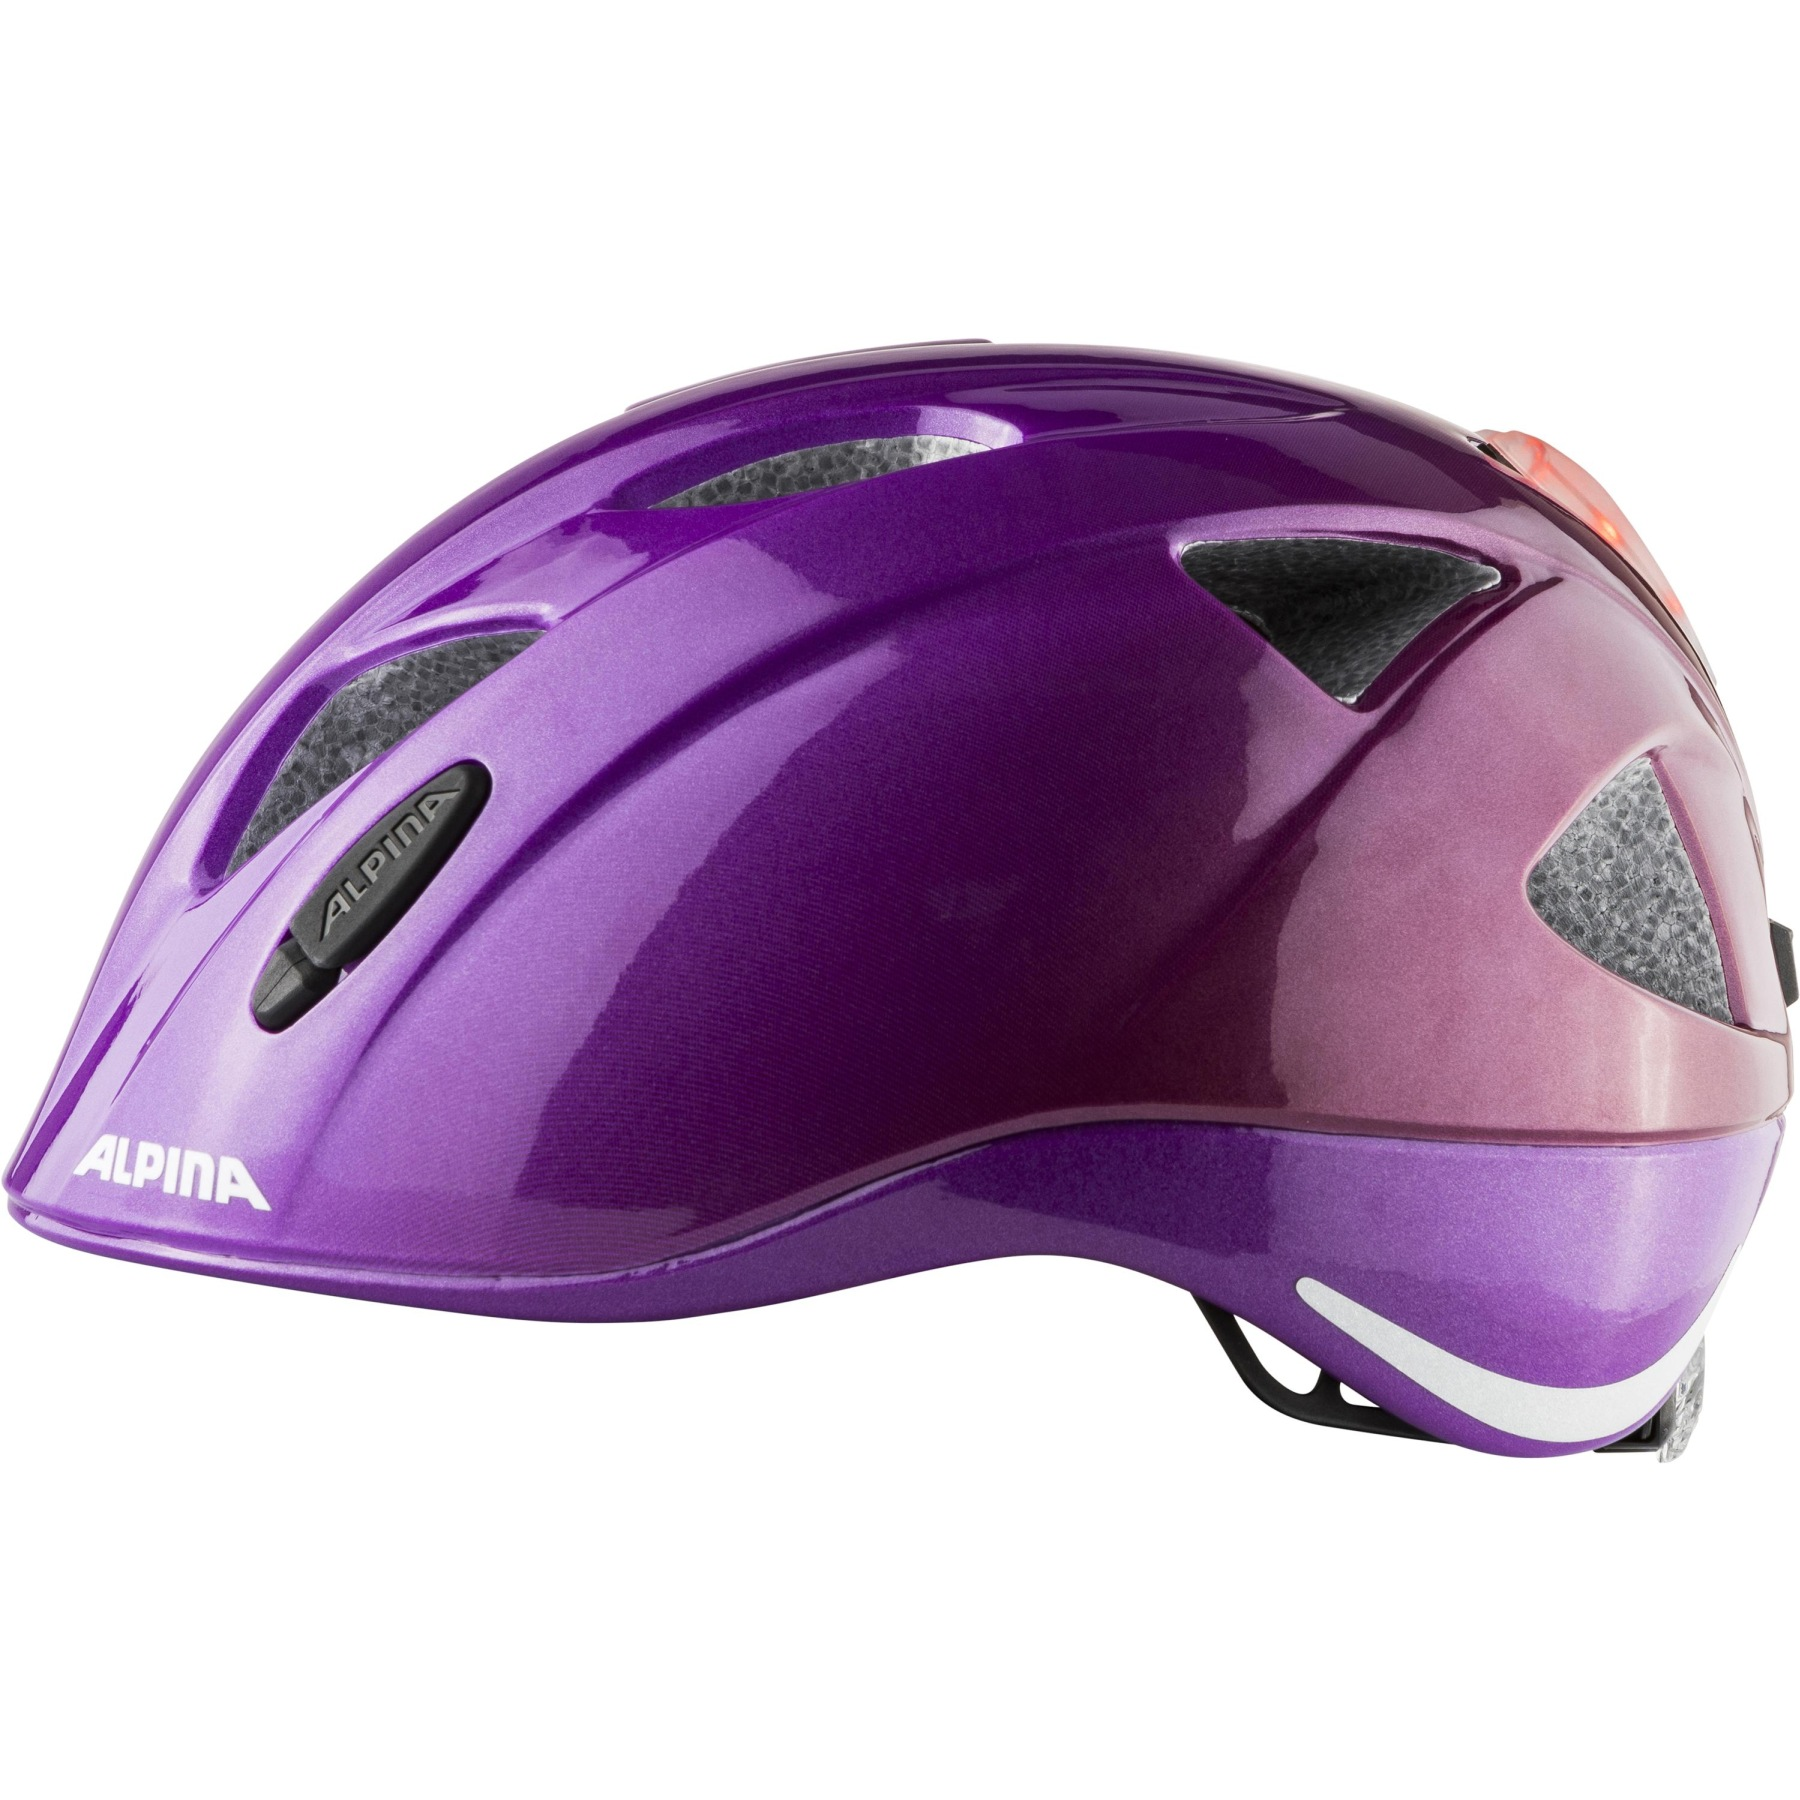 Image of Alpina Ximo Flash Kids Helmet - berry gloss